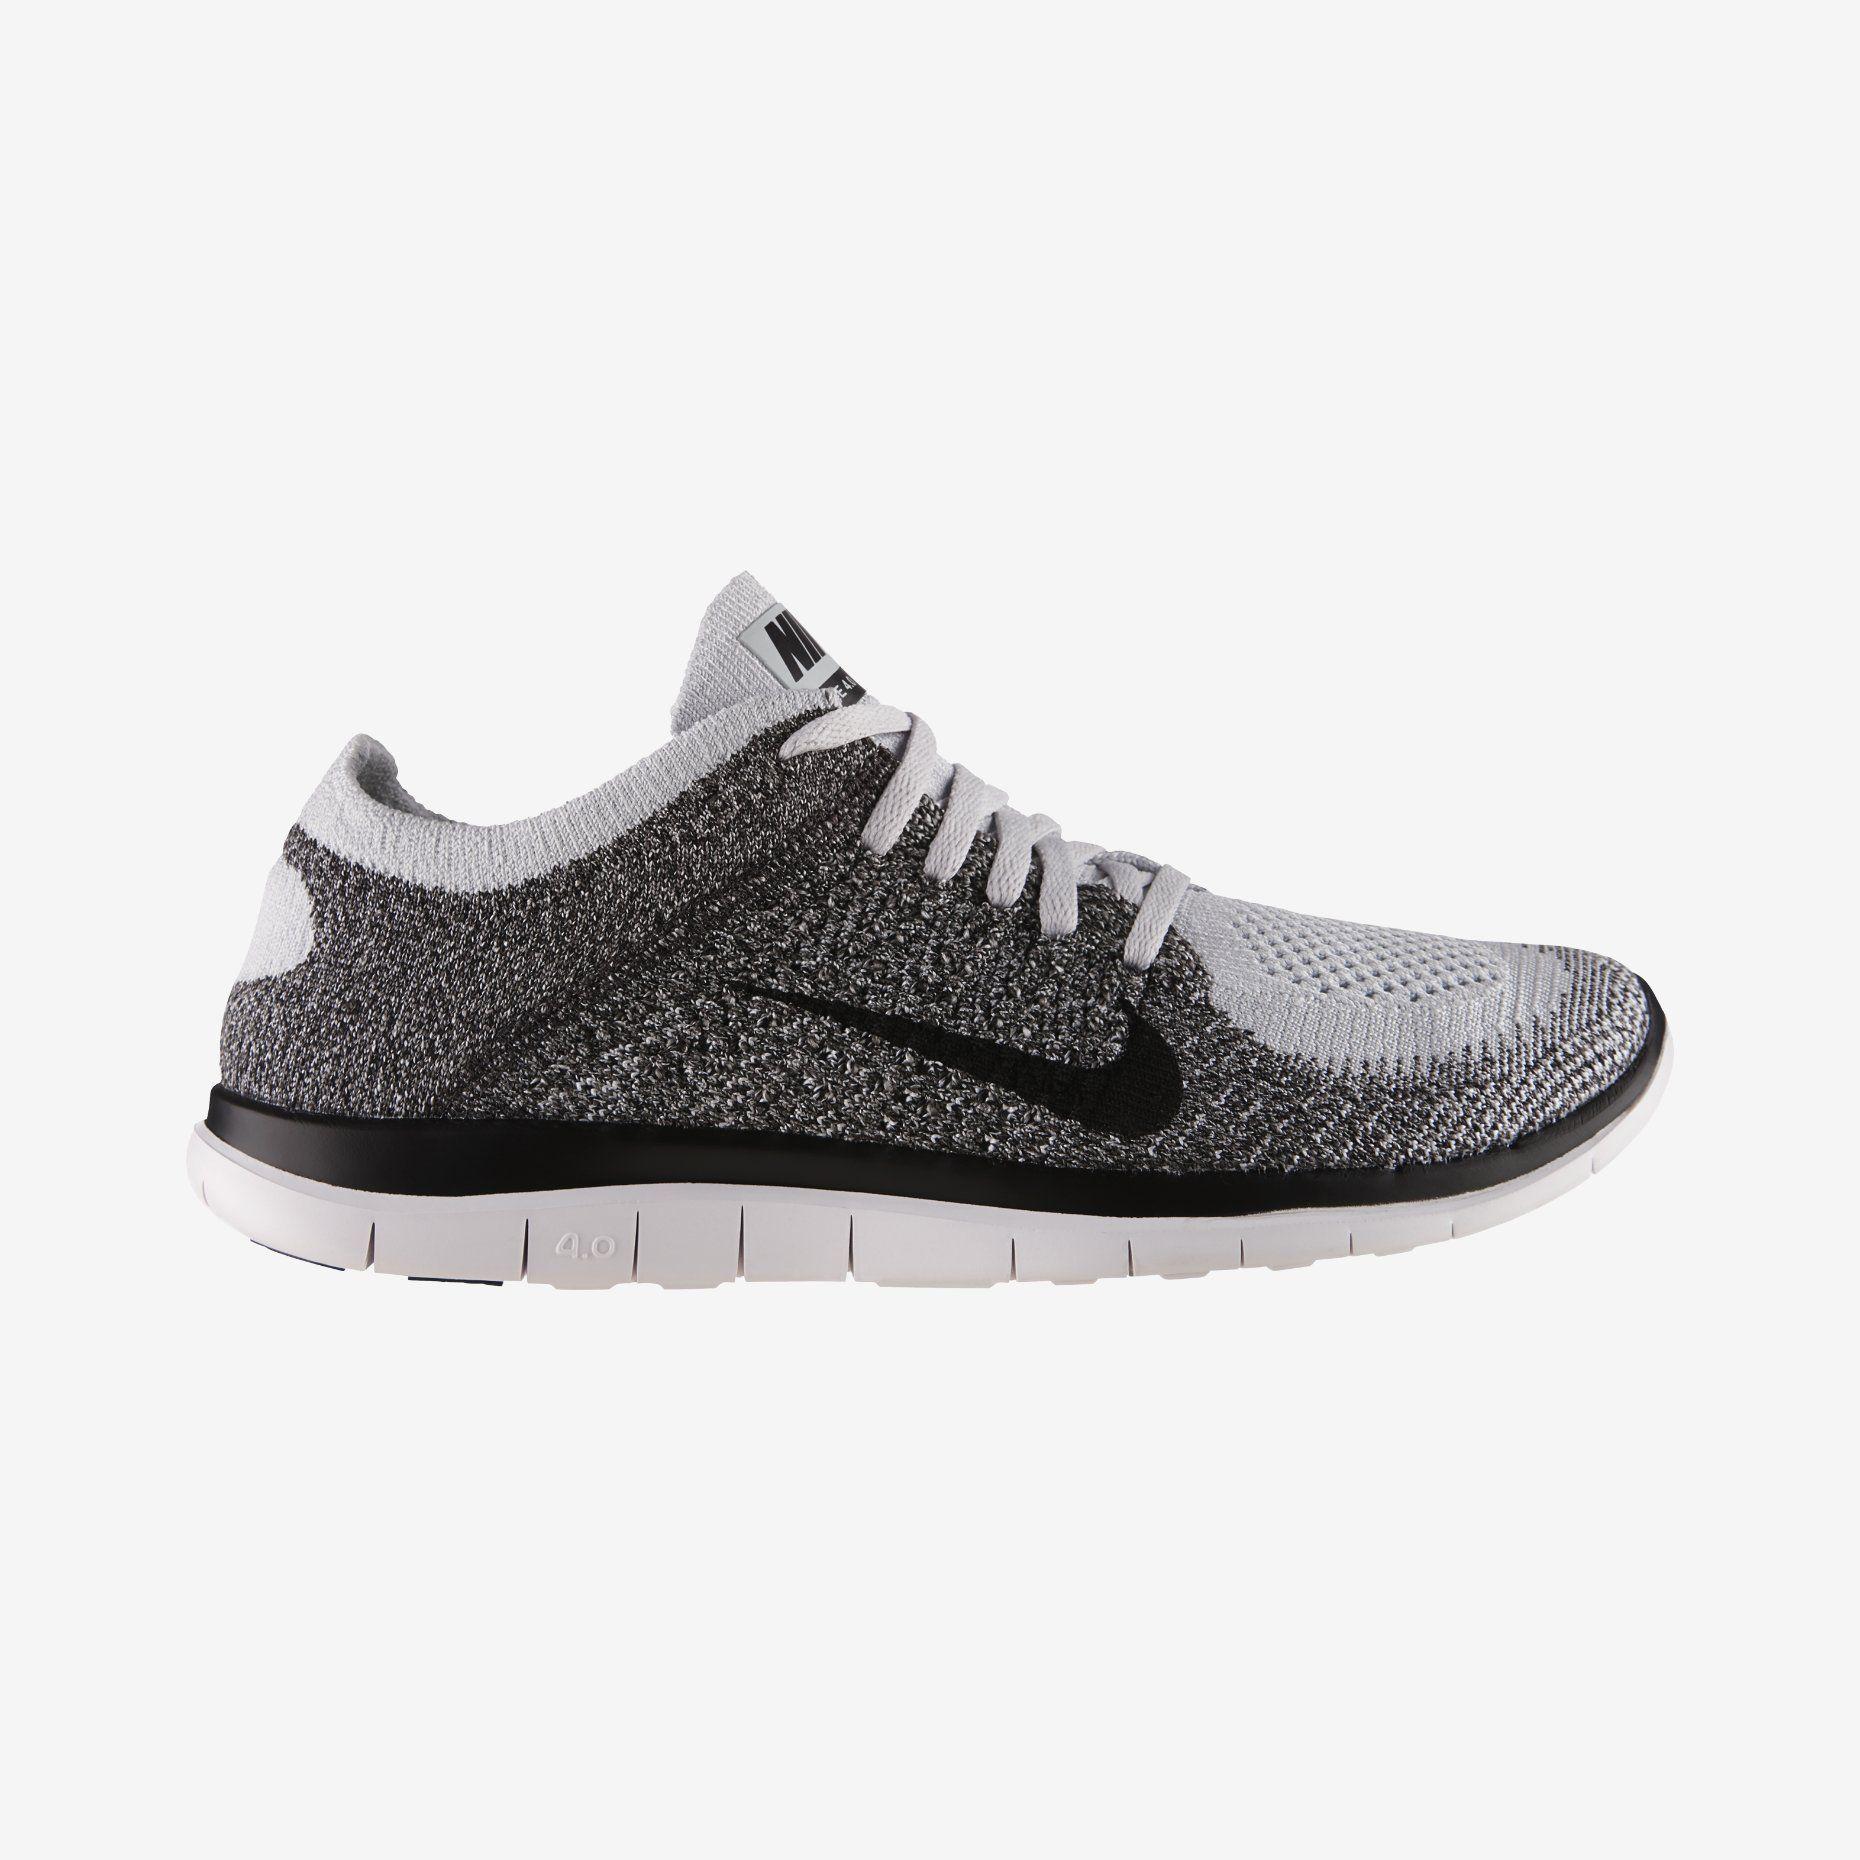 The Nike Free 4.0 Flyknit Men's Running